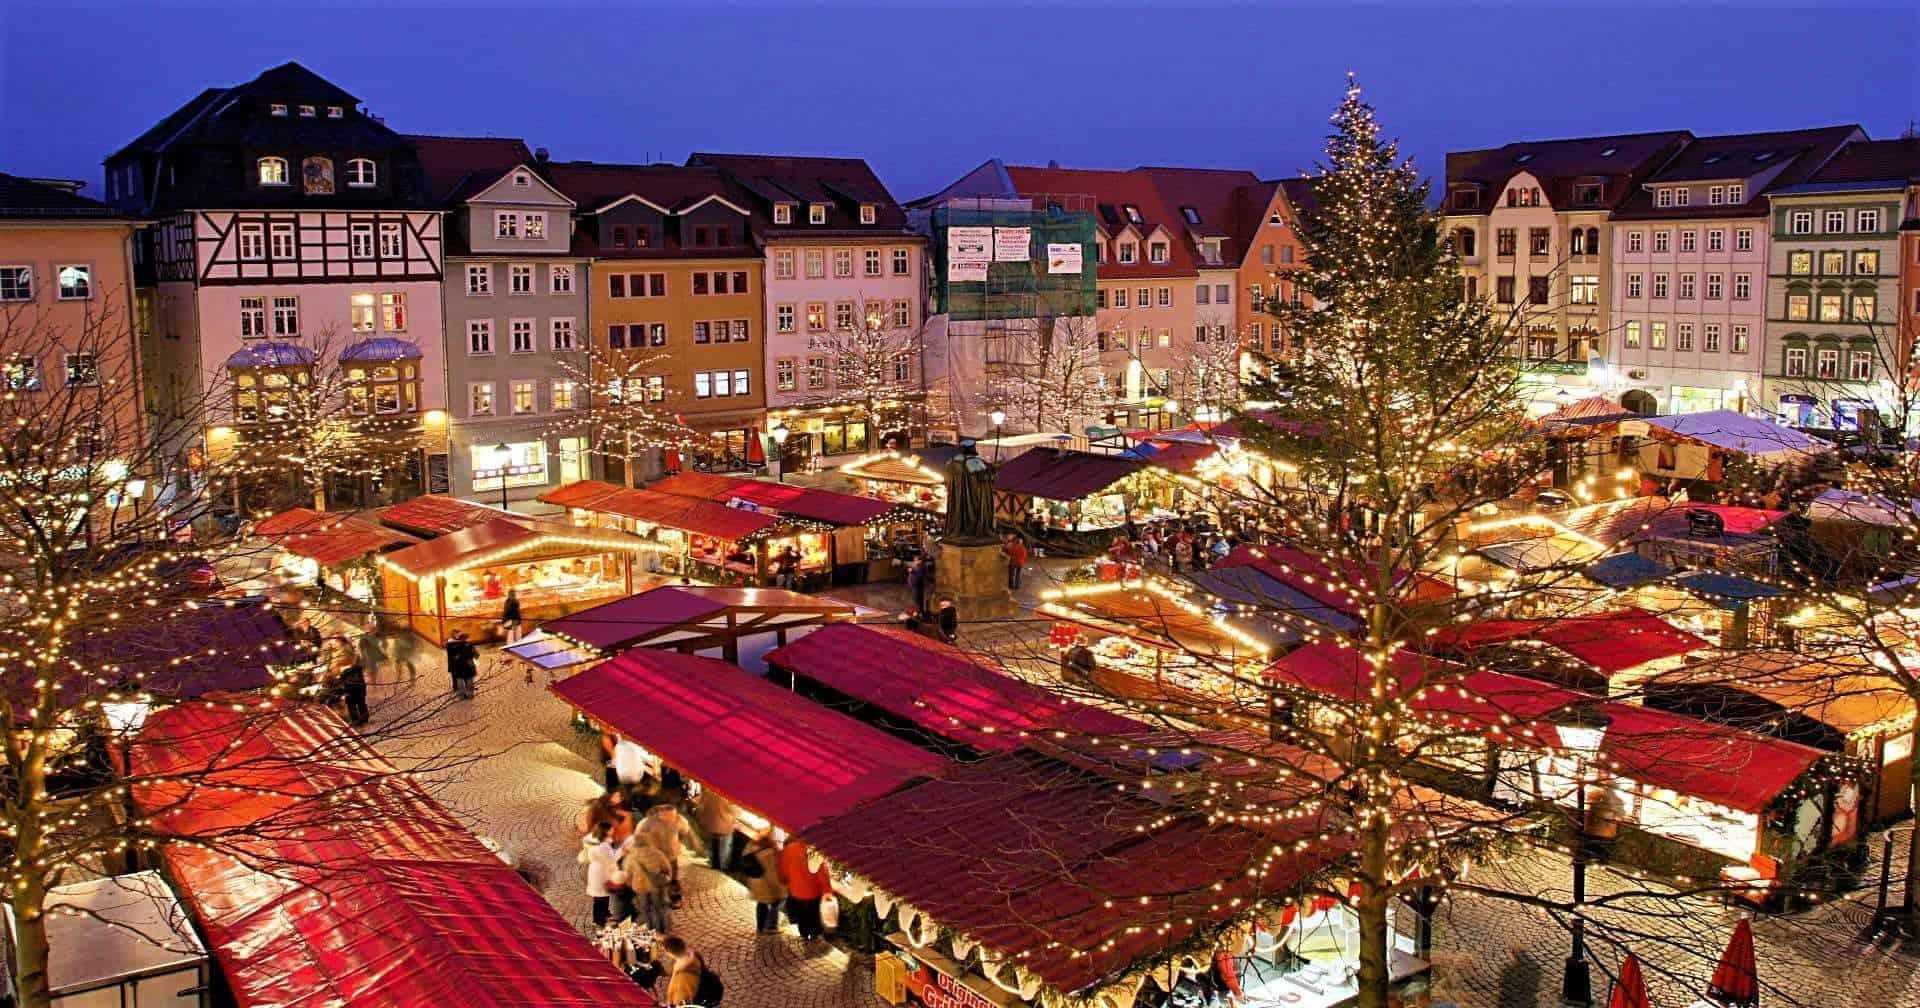 Christmas market Thuringia Germany